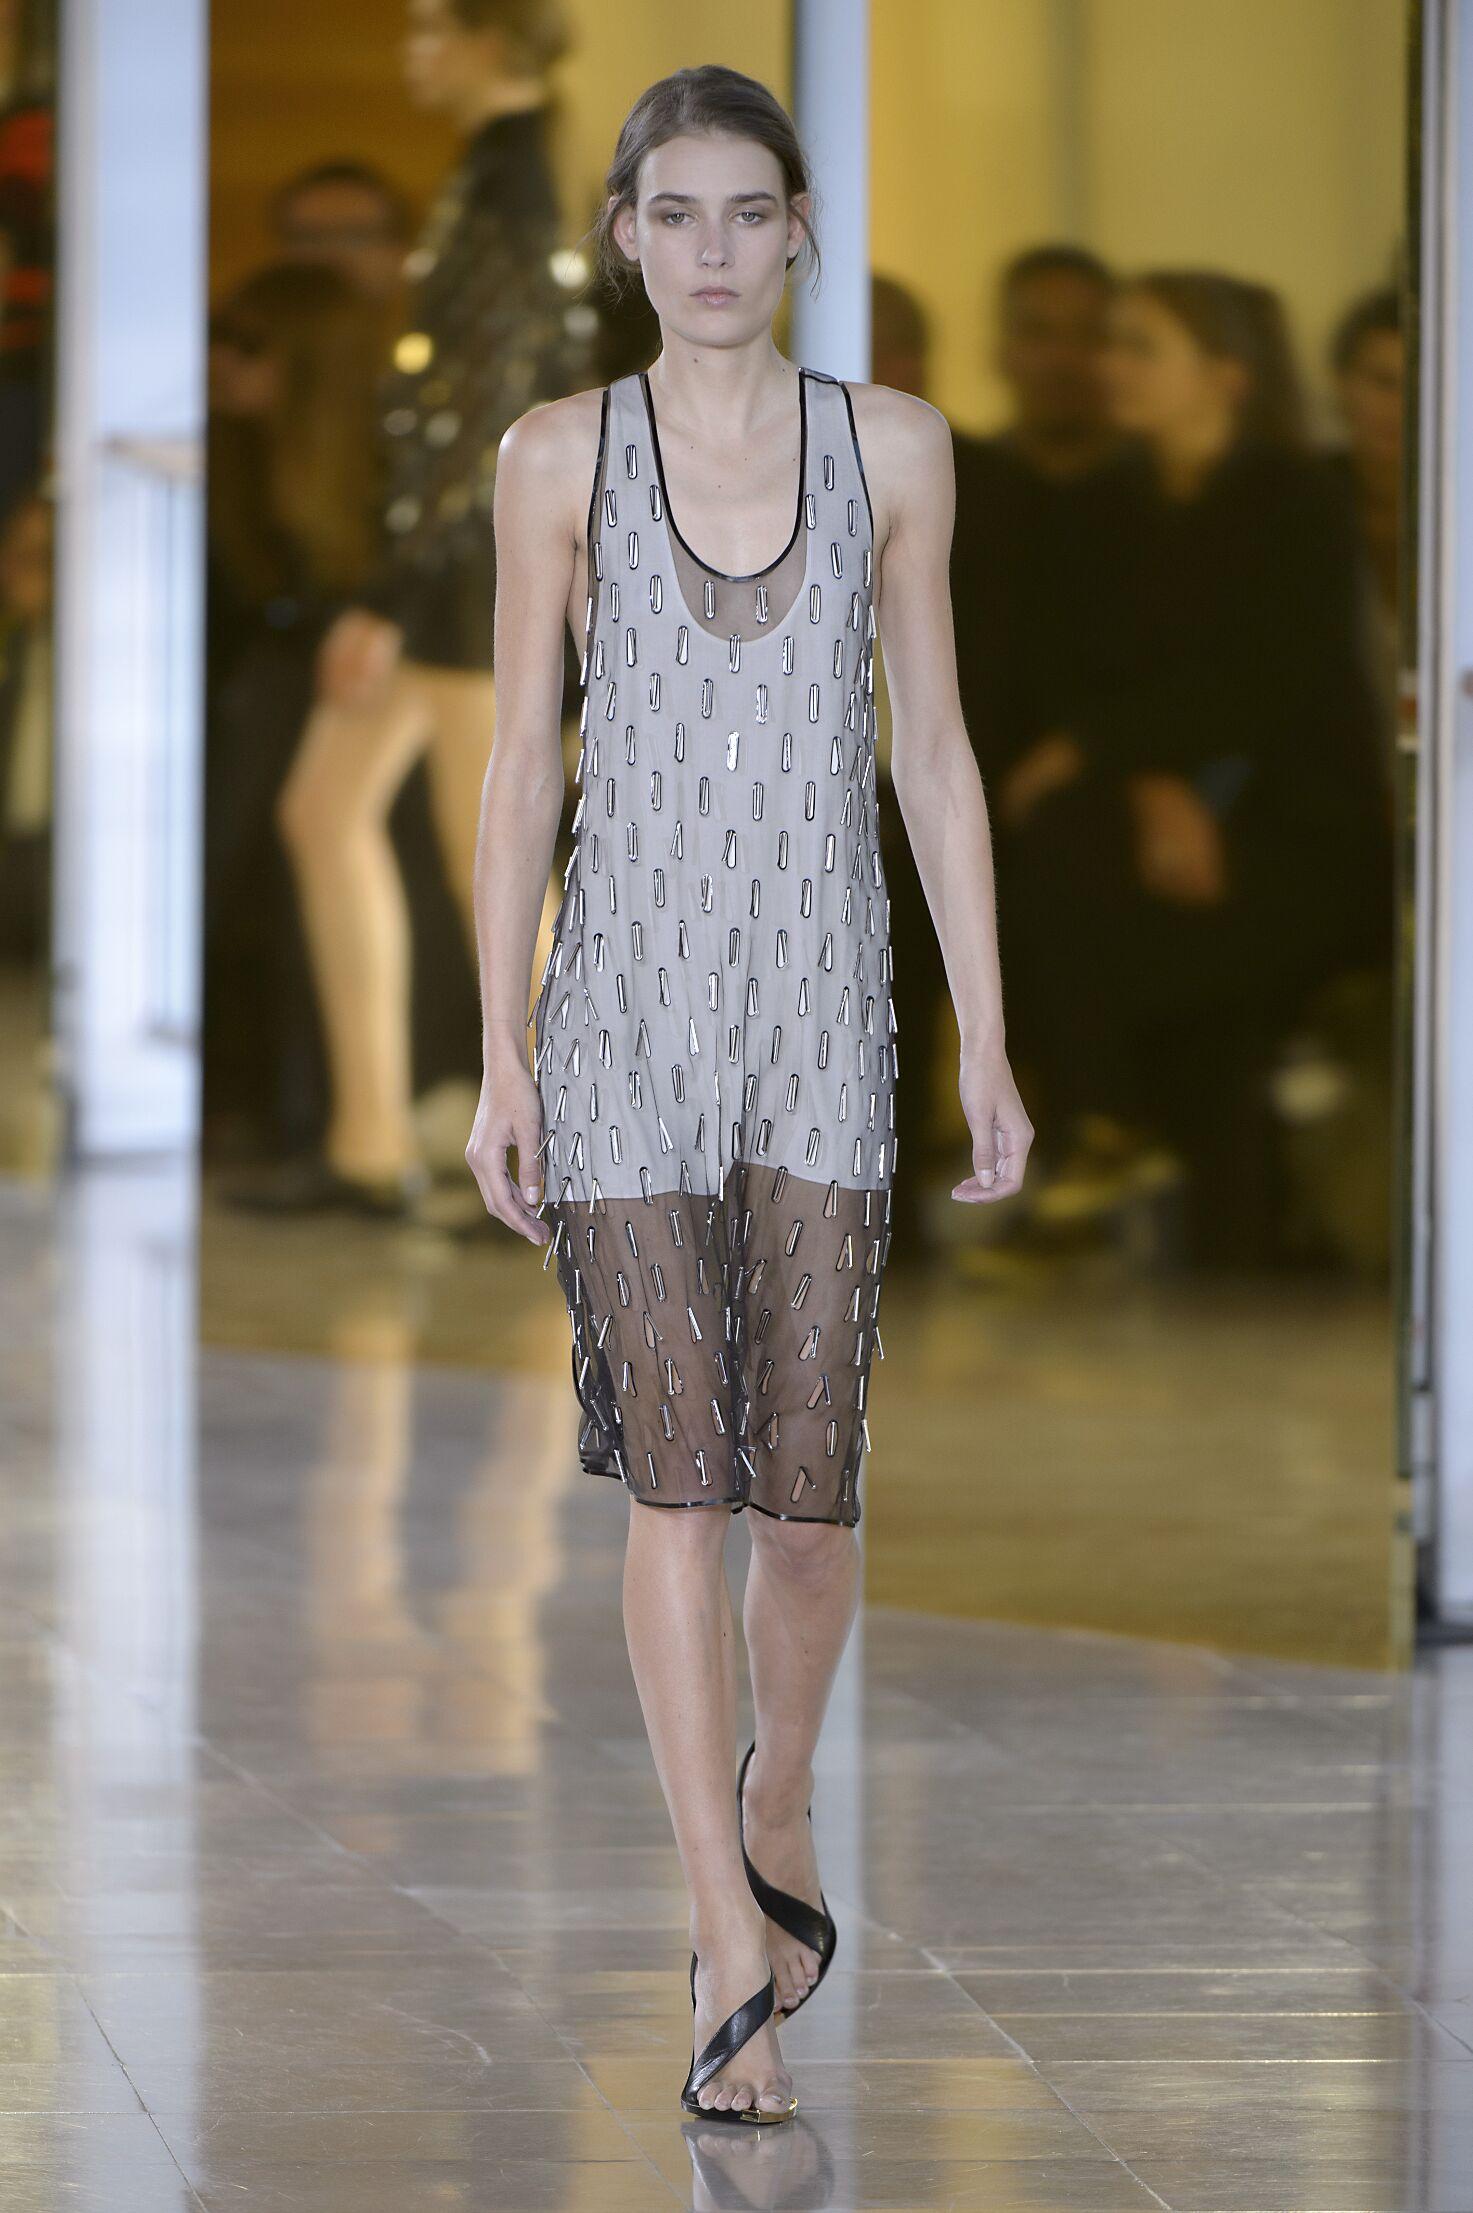 Models Fashion Show Anthony Vaccarello